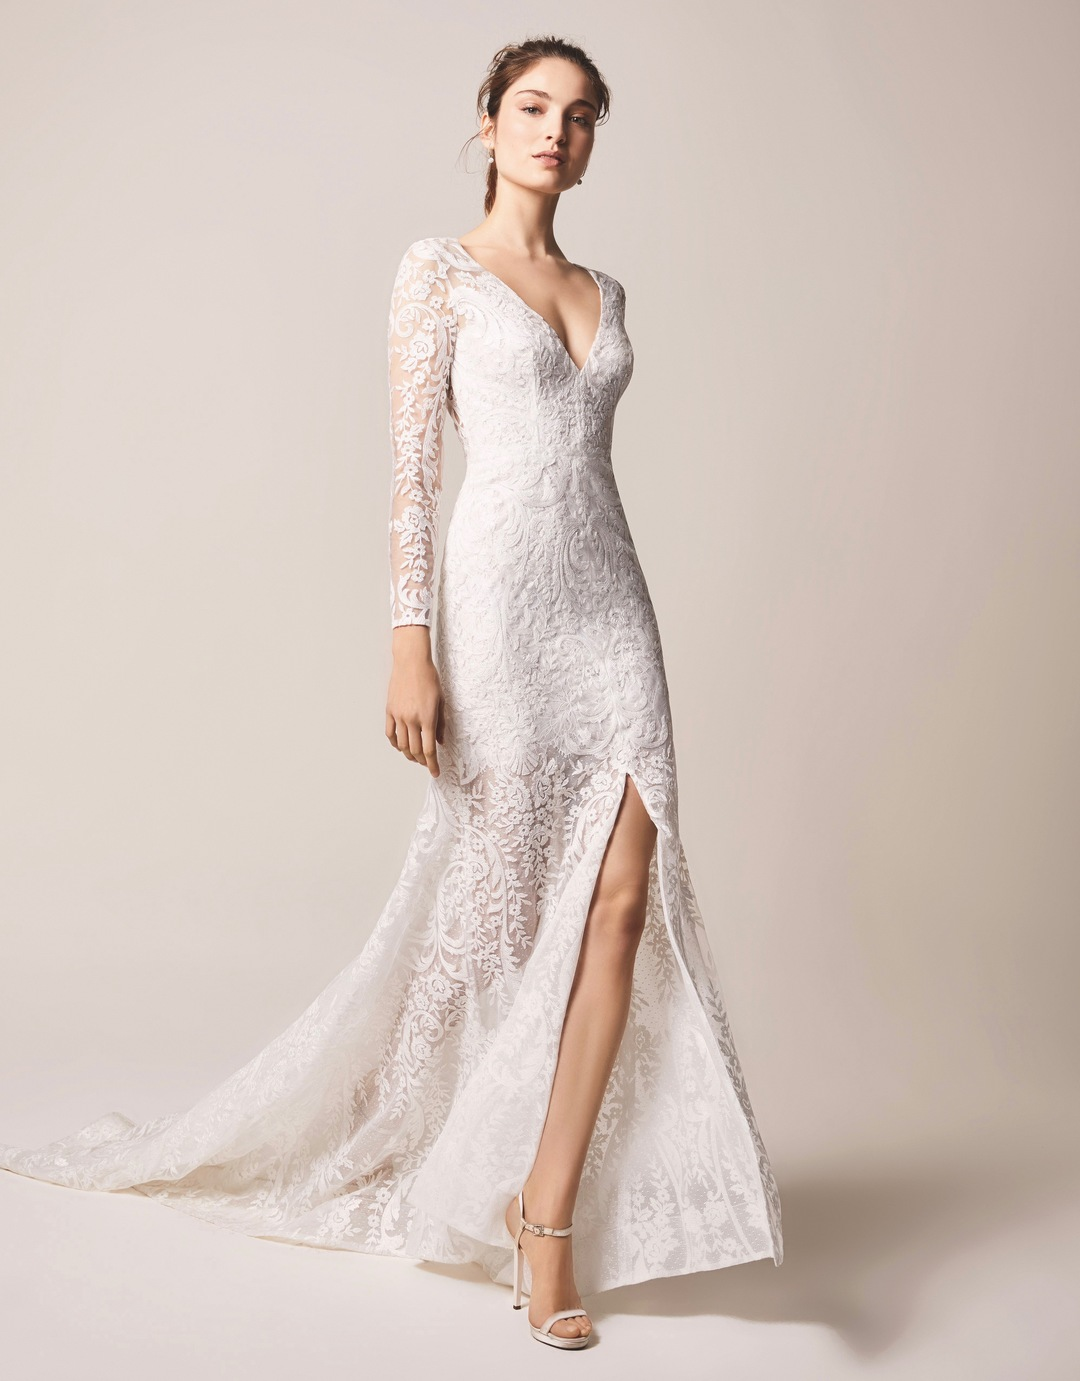 116 dress photo